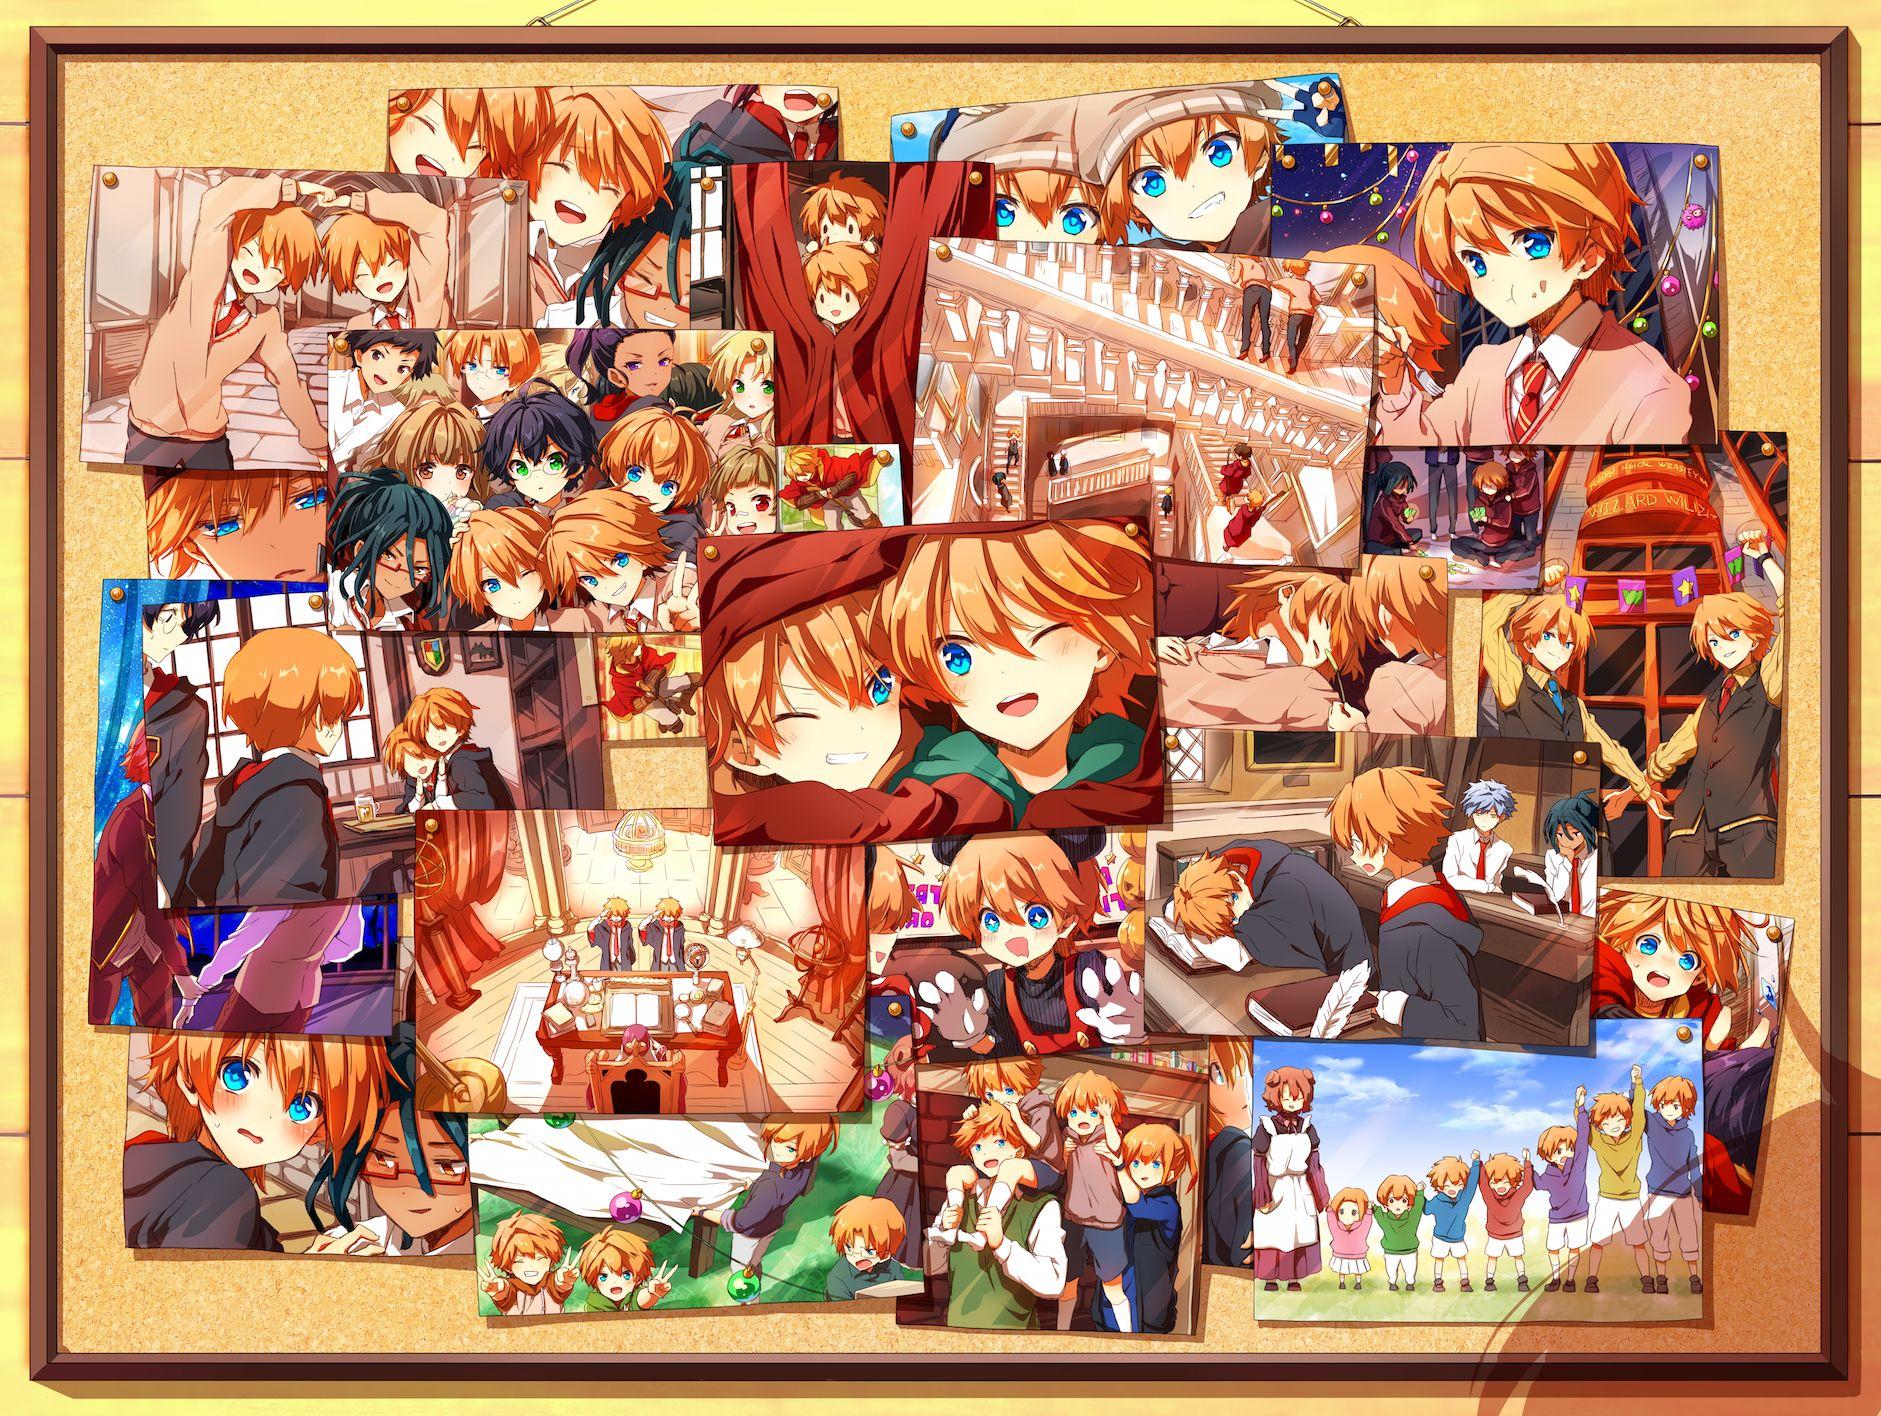 Top Wallpaper Harry Potter Collage - e5af0dabc721ccca75aabcc532e7fd4f  Snapshot_667527.jpg